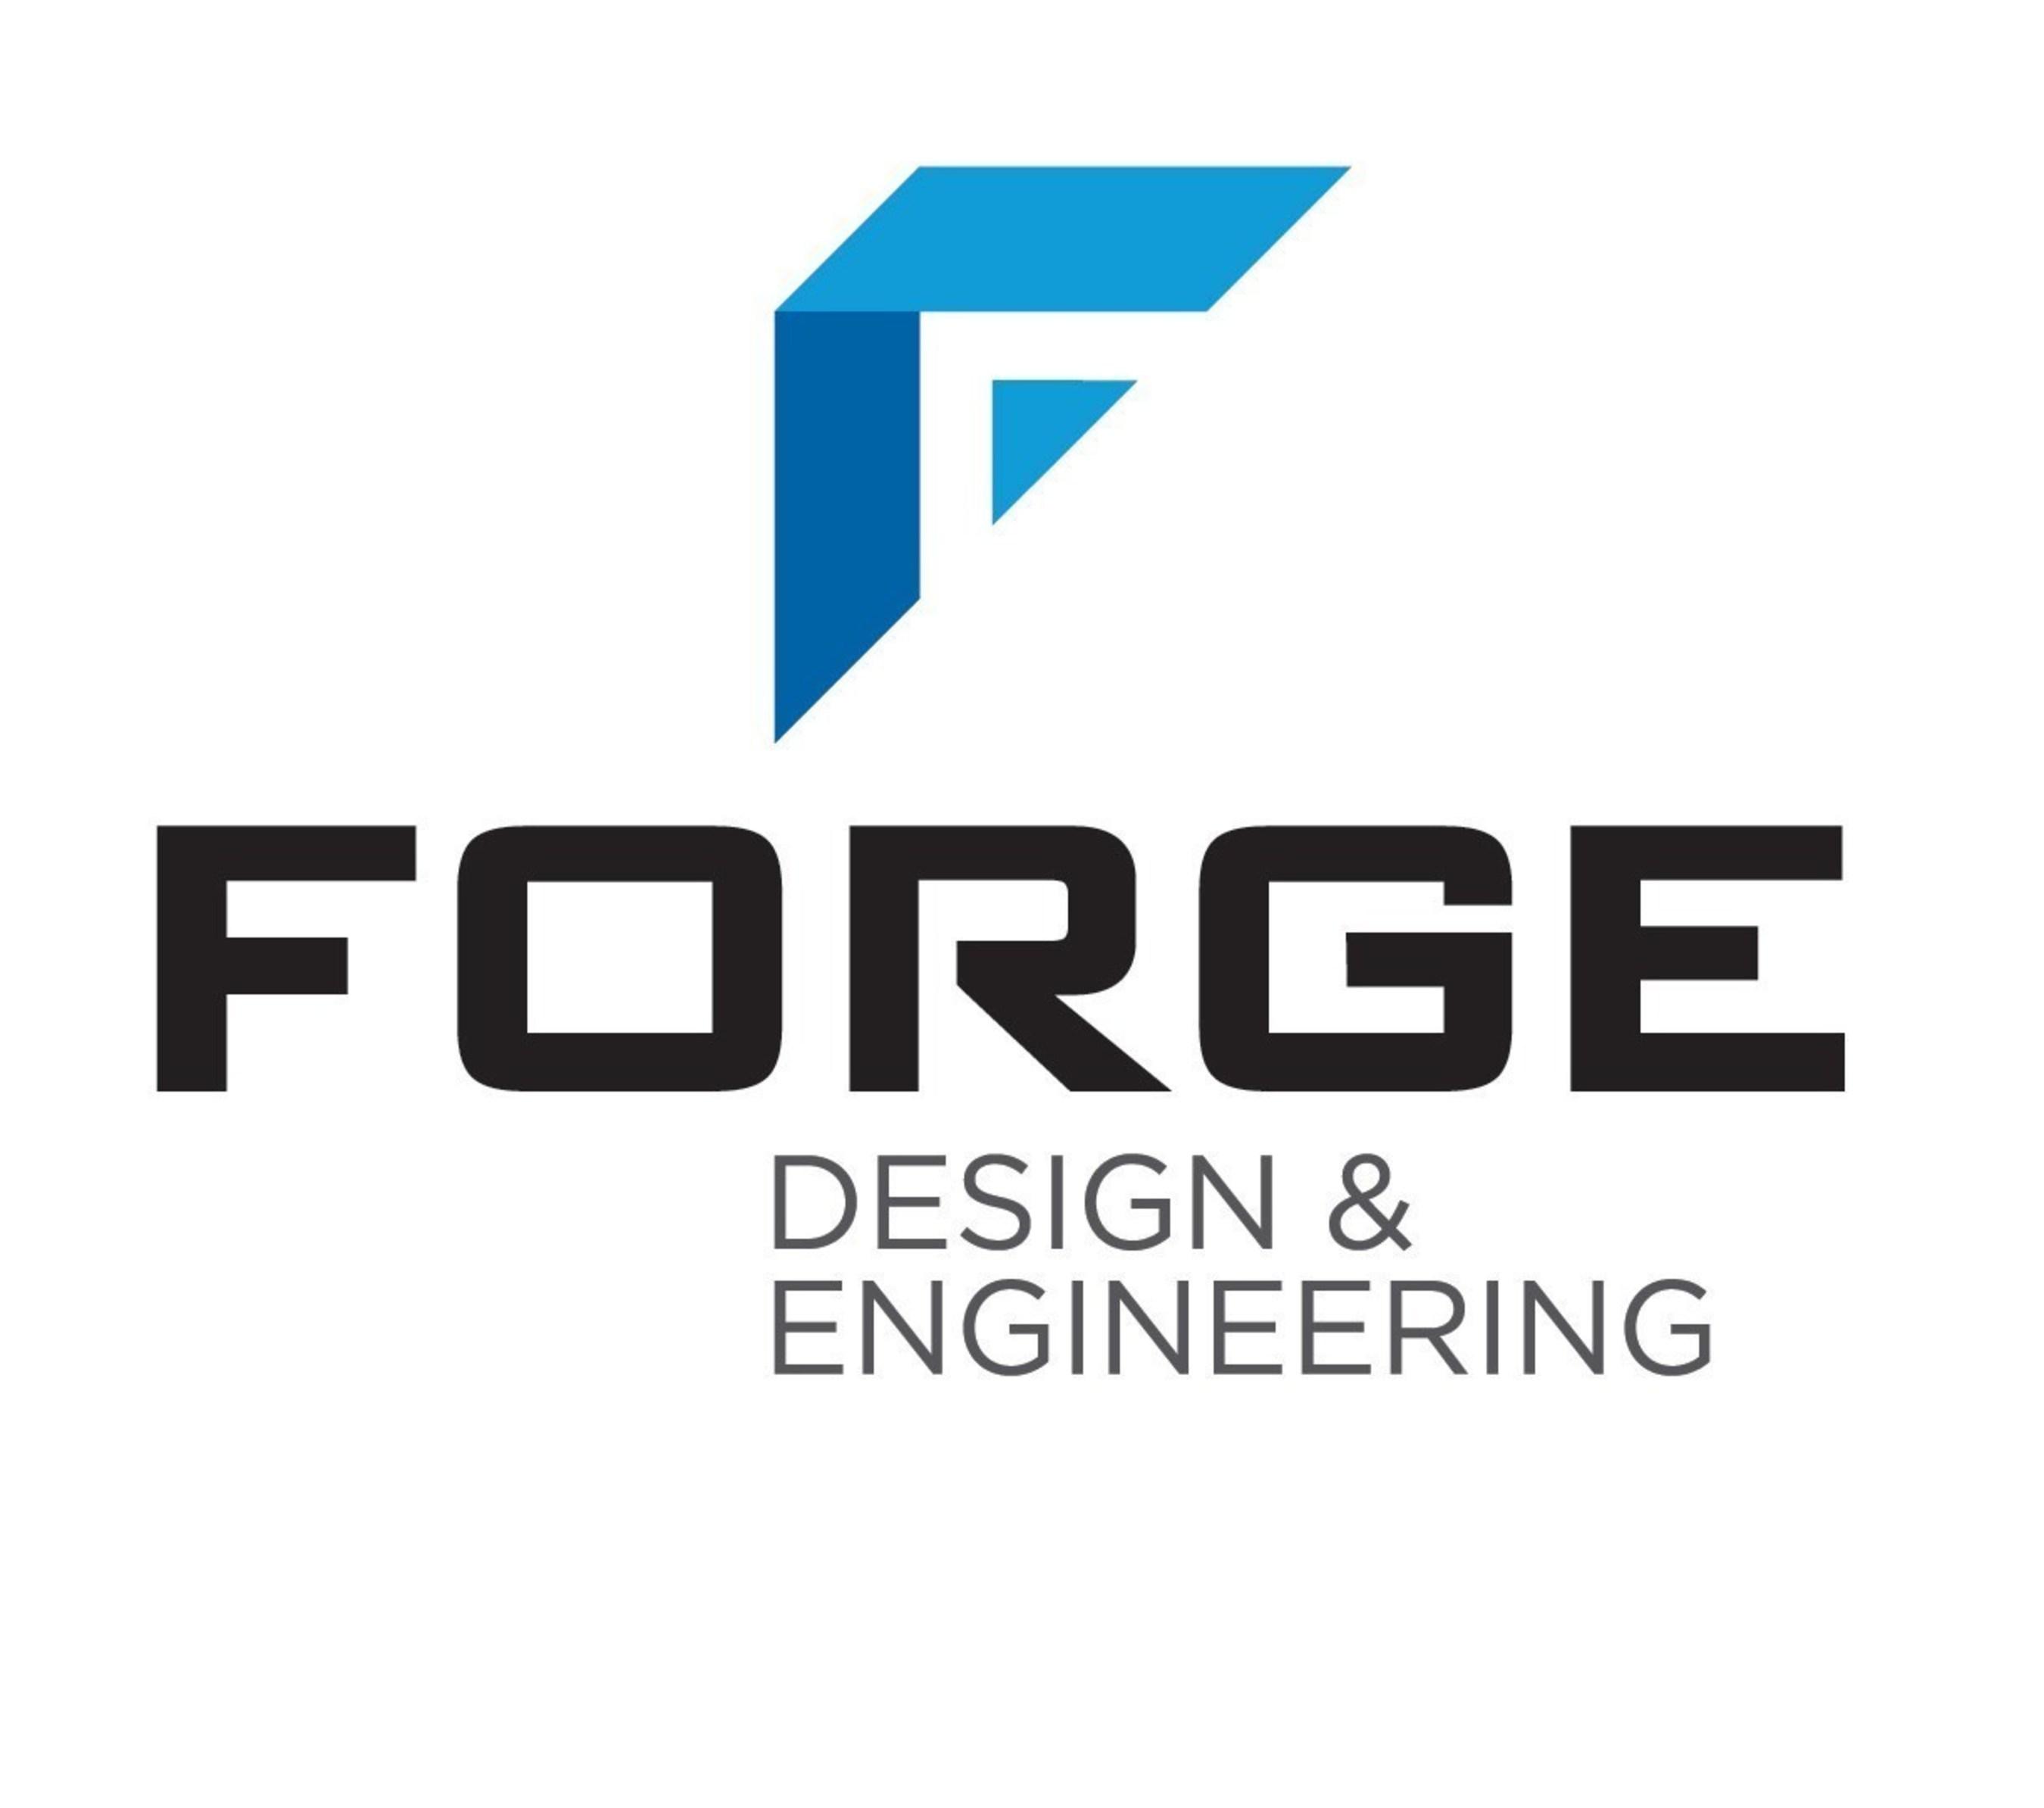 Forge Design & Engineering